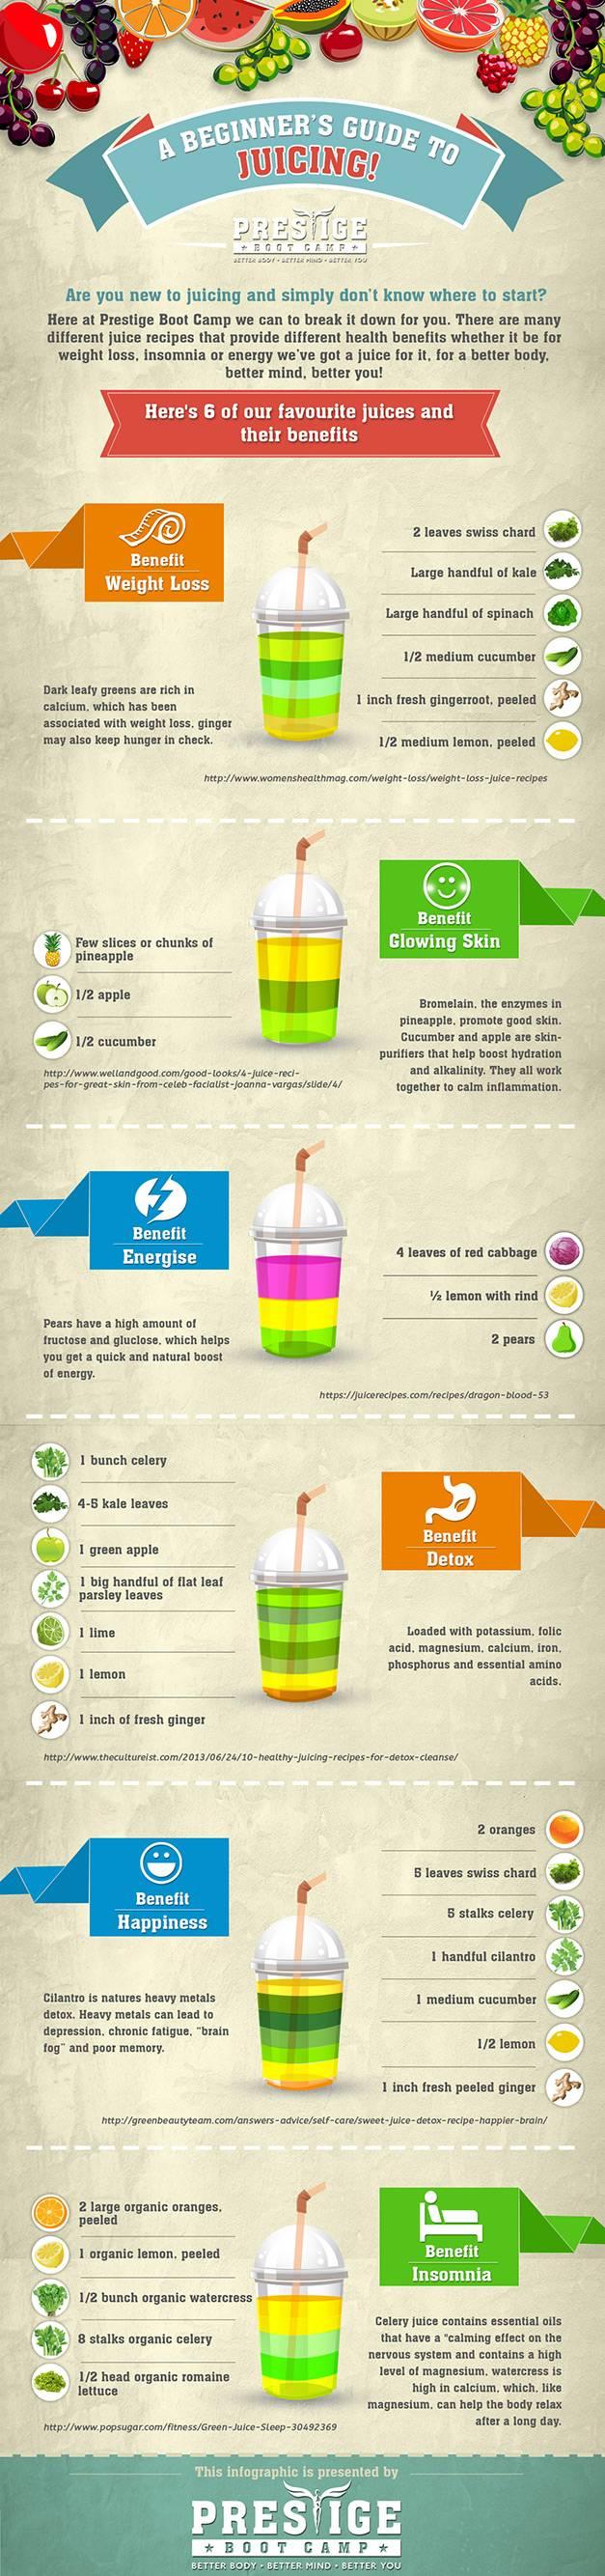 Juicing-Infographic